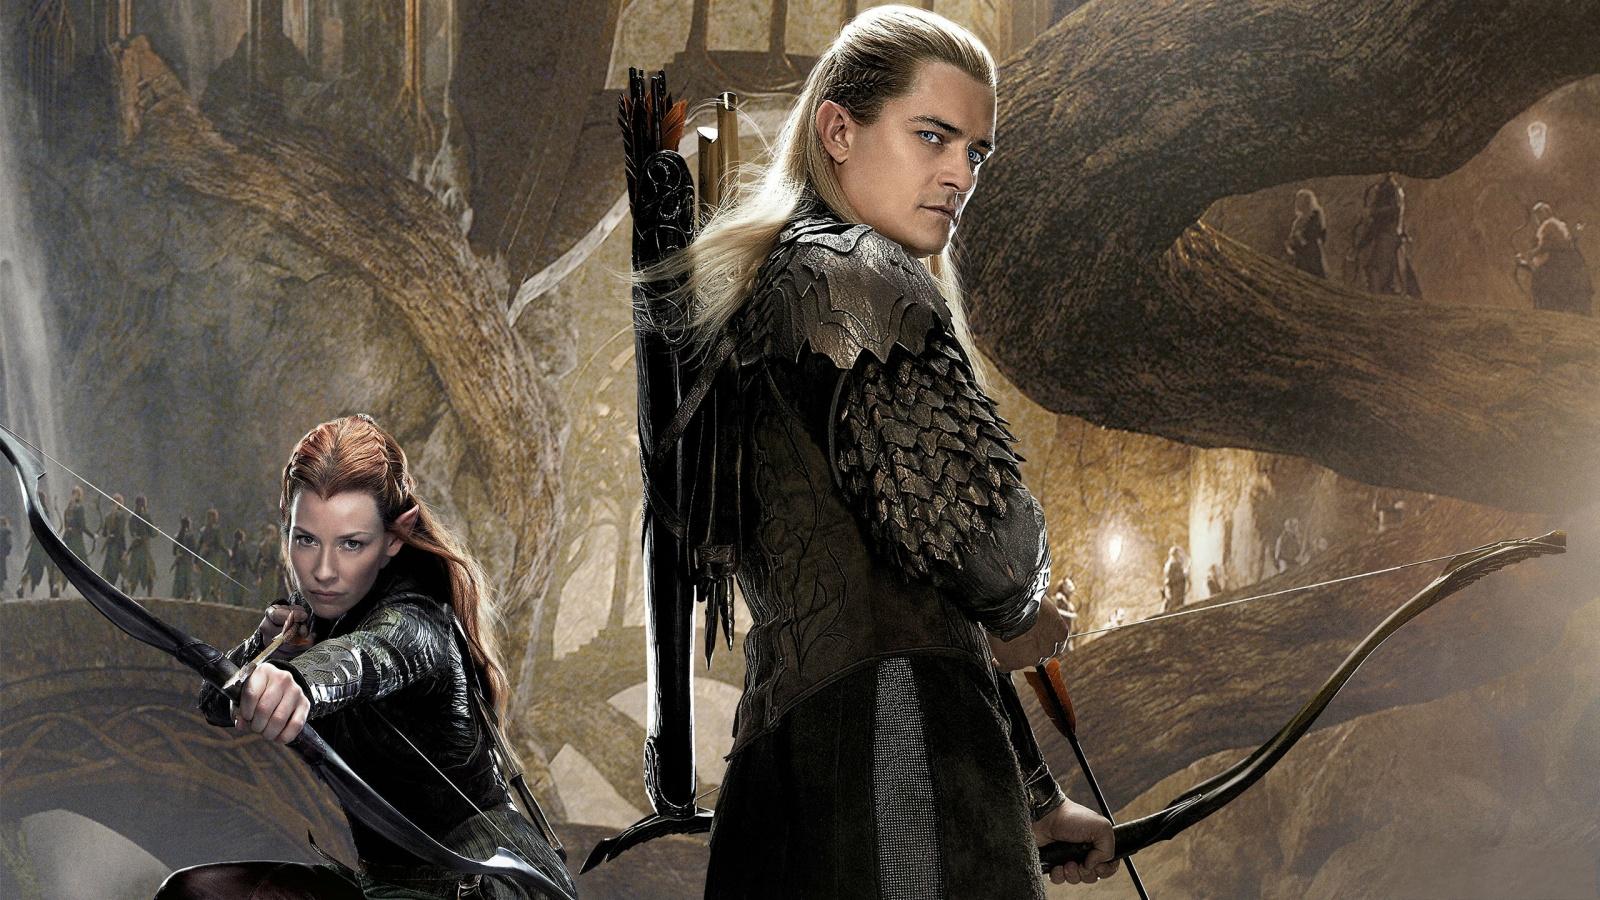 Tauriel Legolas In The Hobbit 2 Wallpapers - 1600x900 - 690360